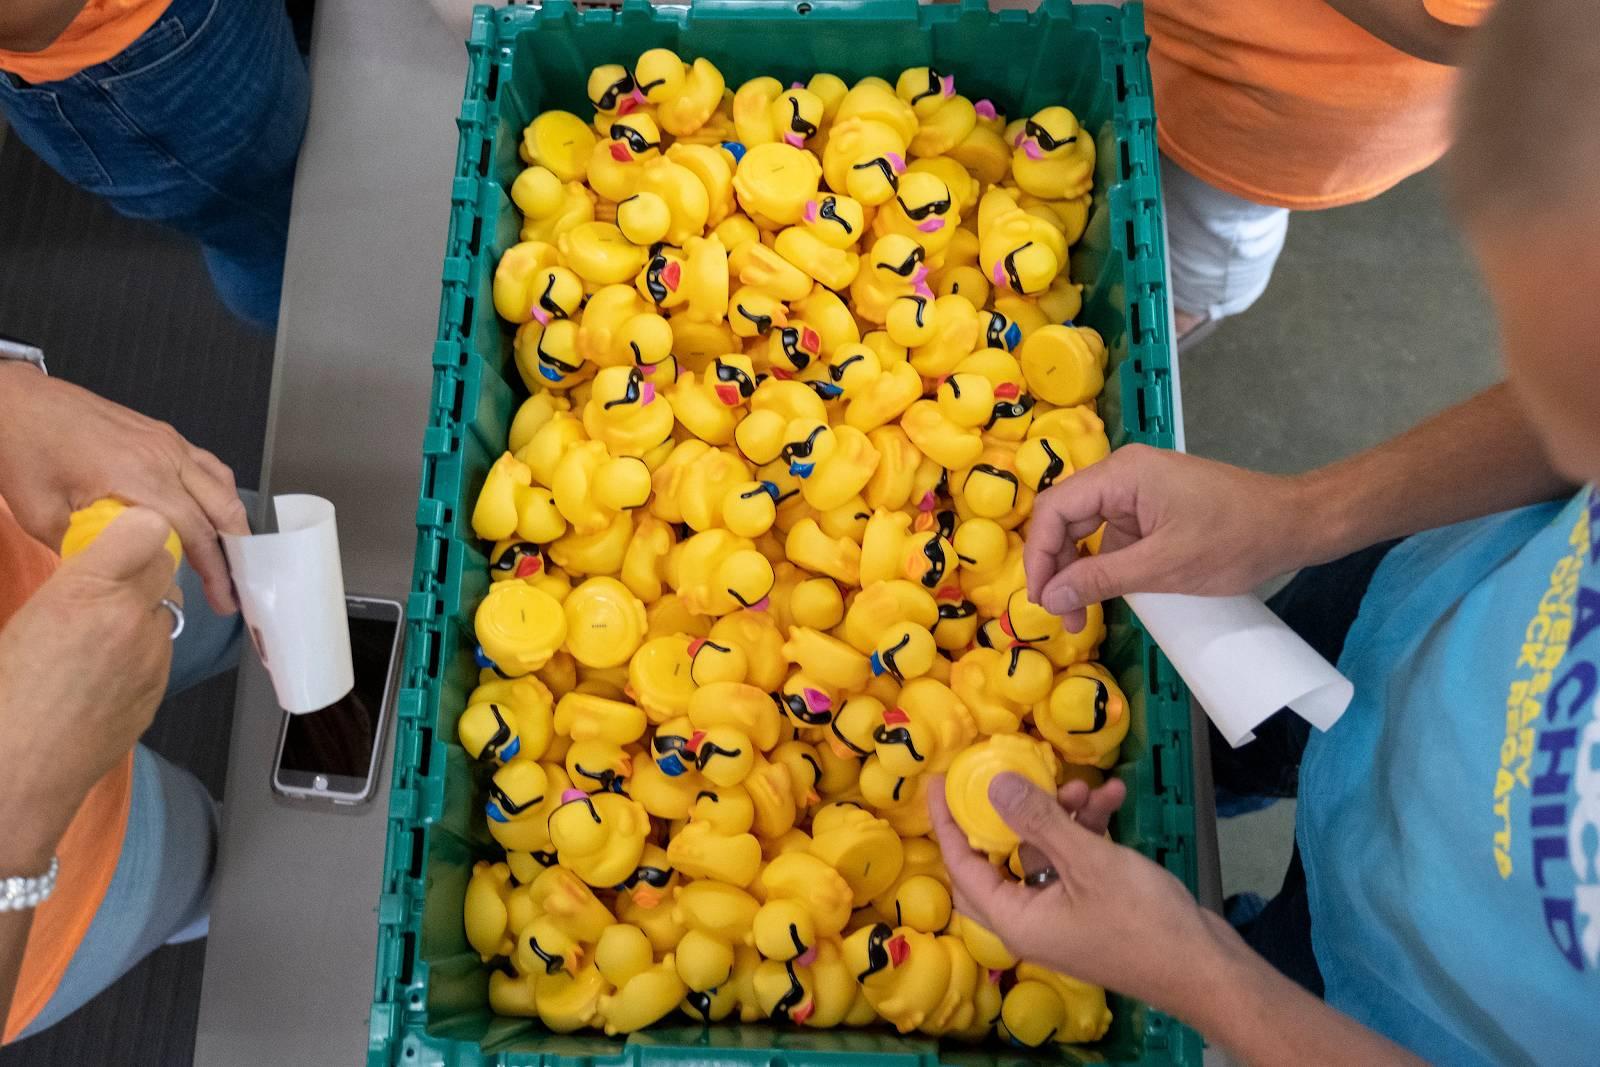 Buy a duck